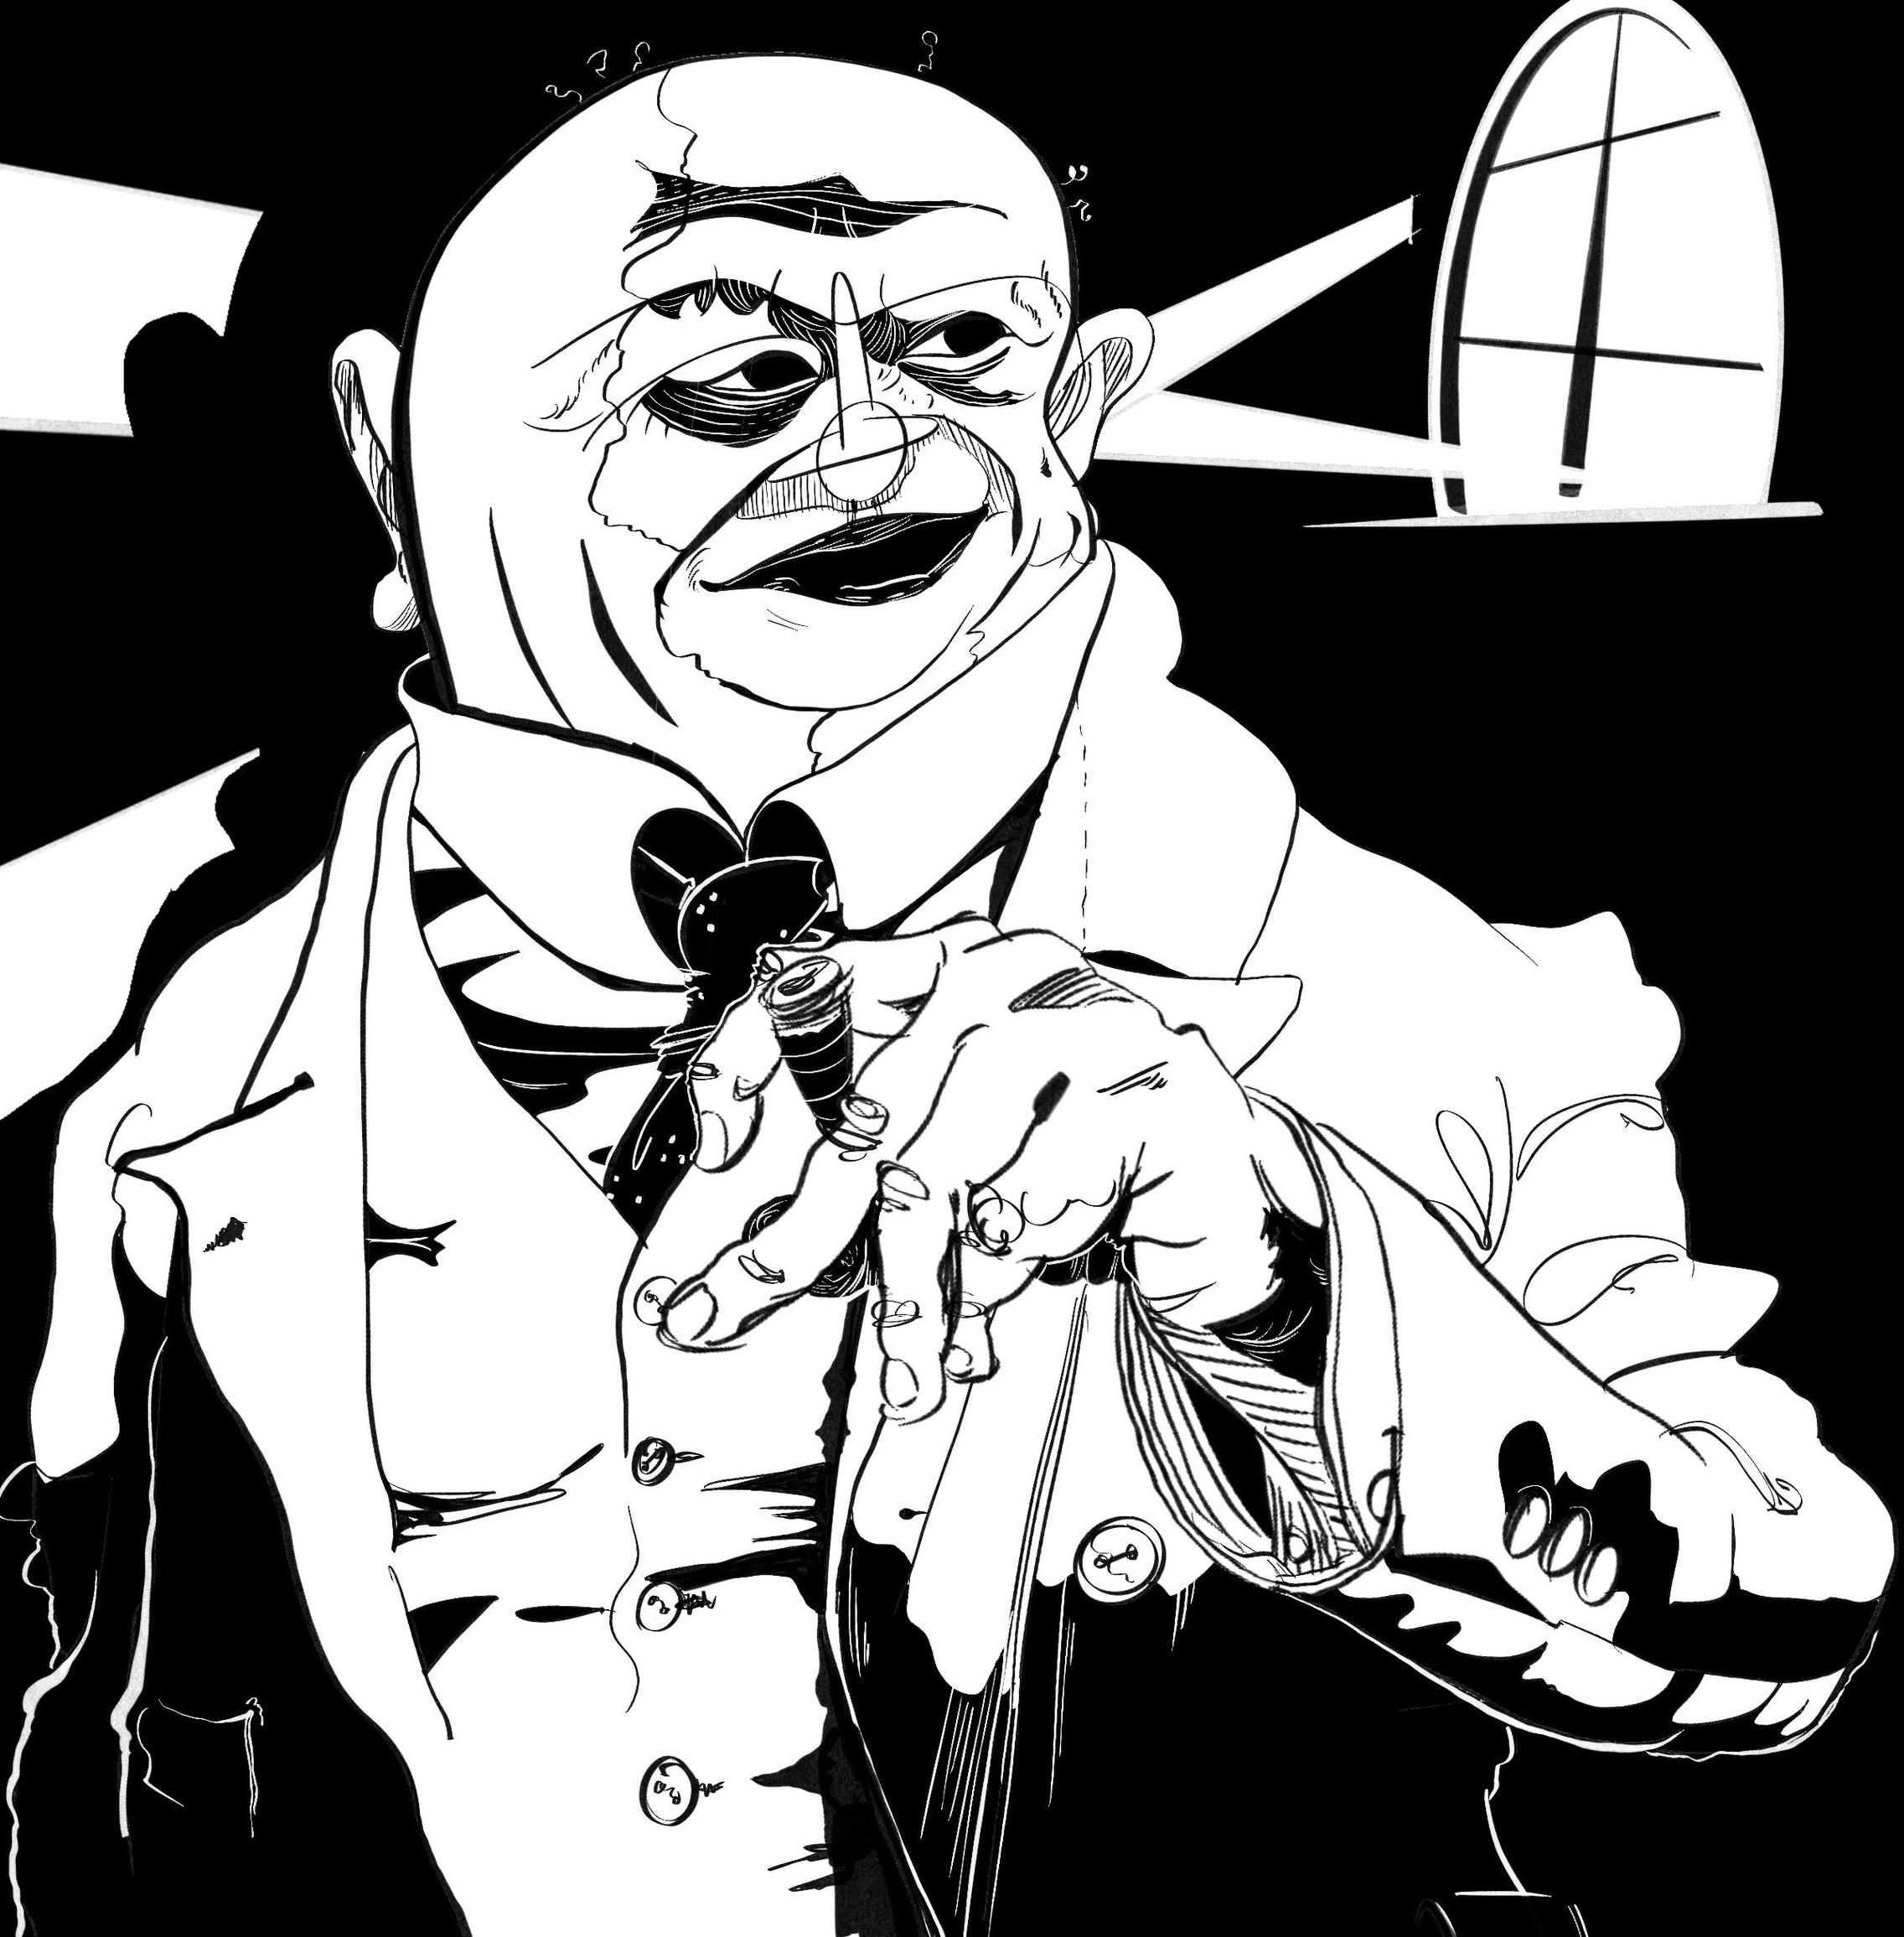 Portrait of Jean Sibelius, sketch by Jeremy Lewis,  www.jeremylewis.com